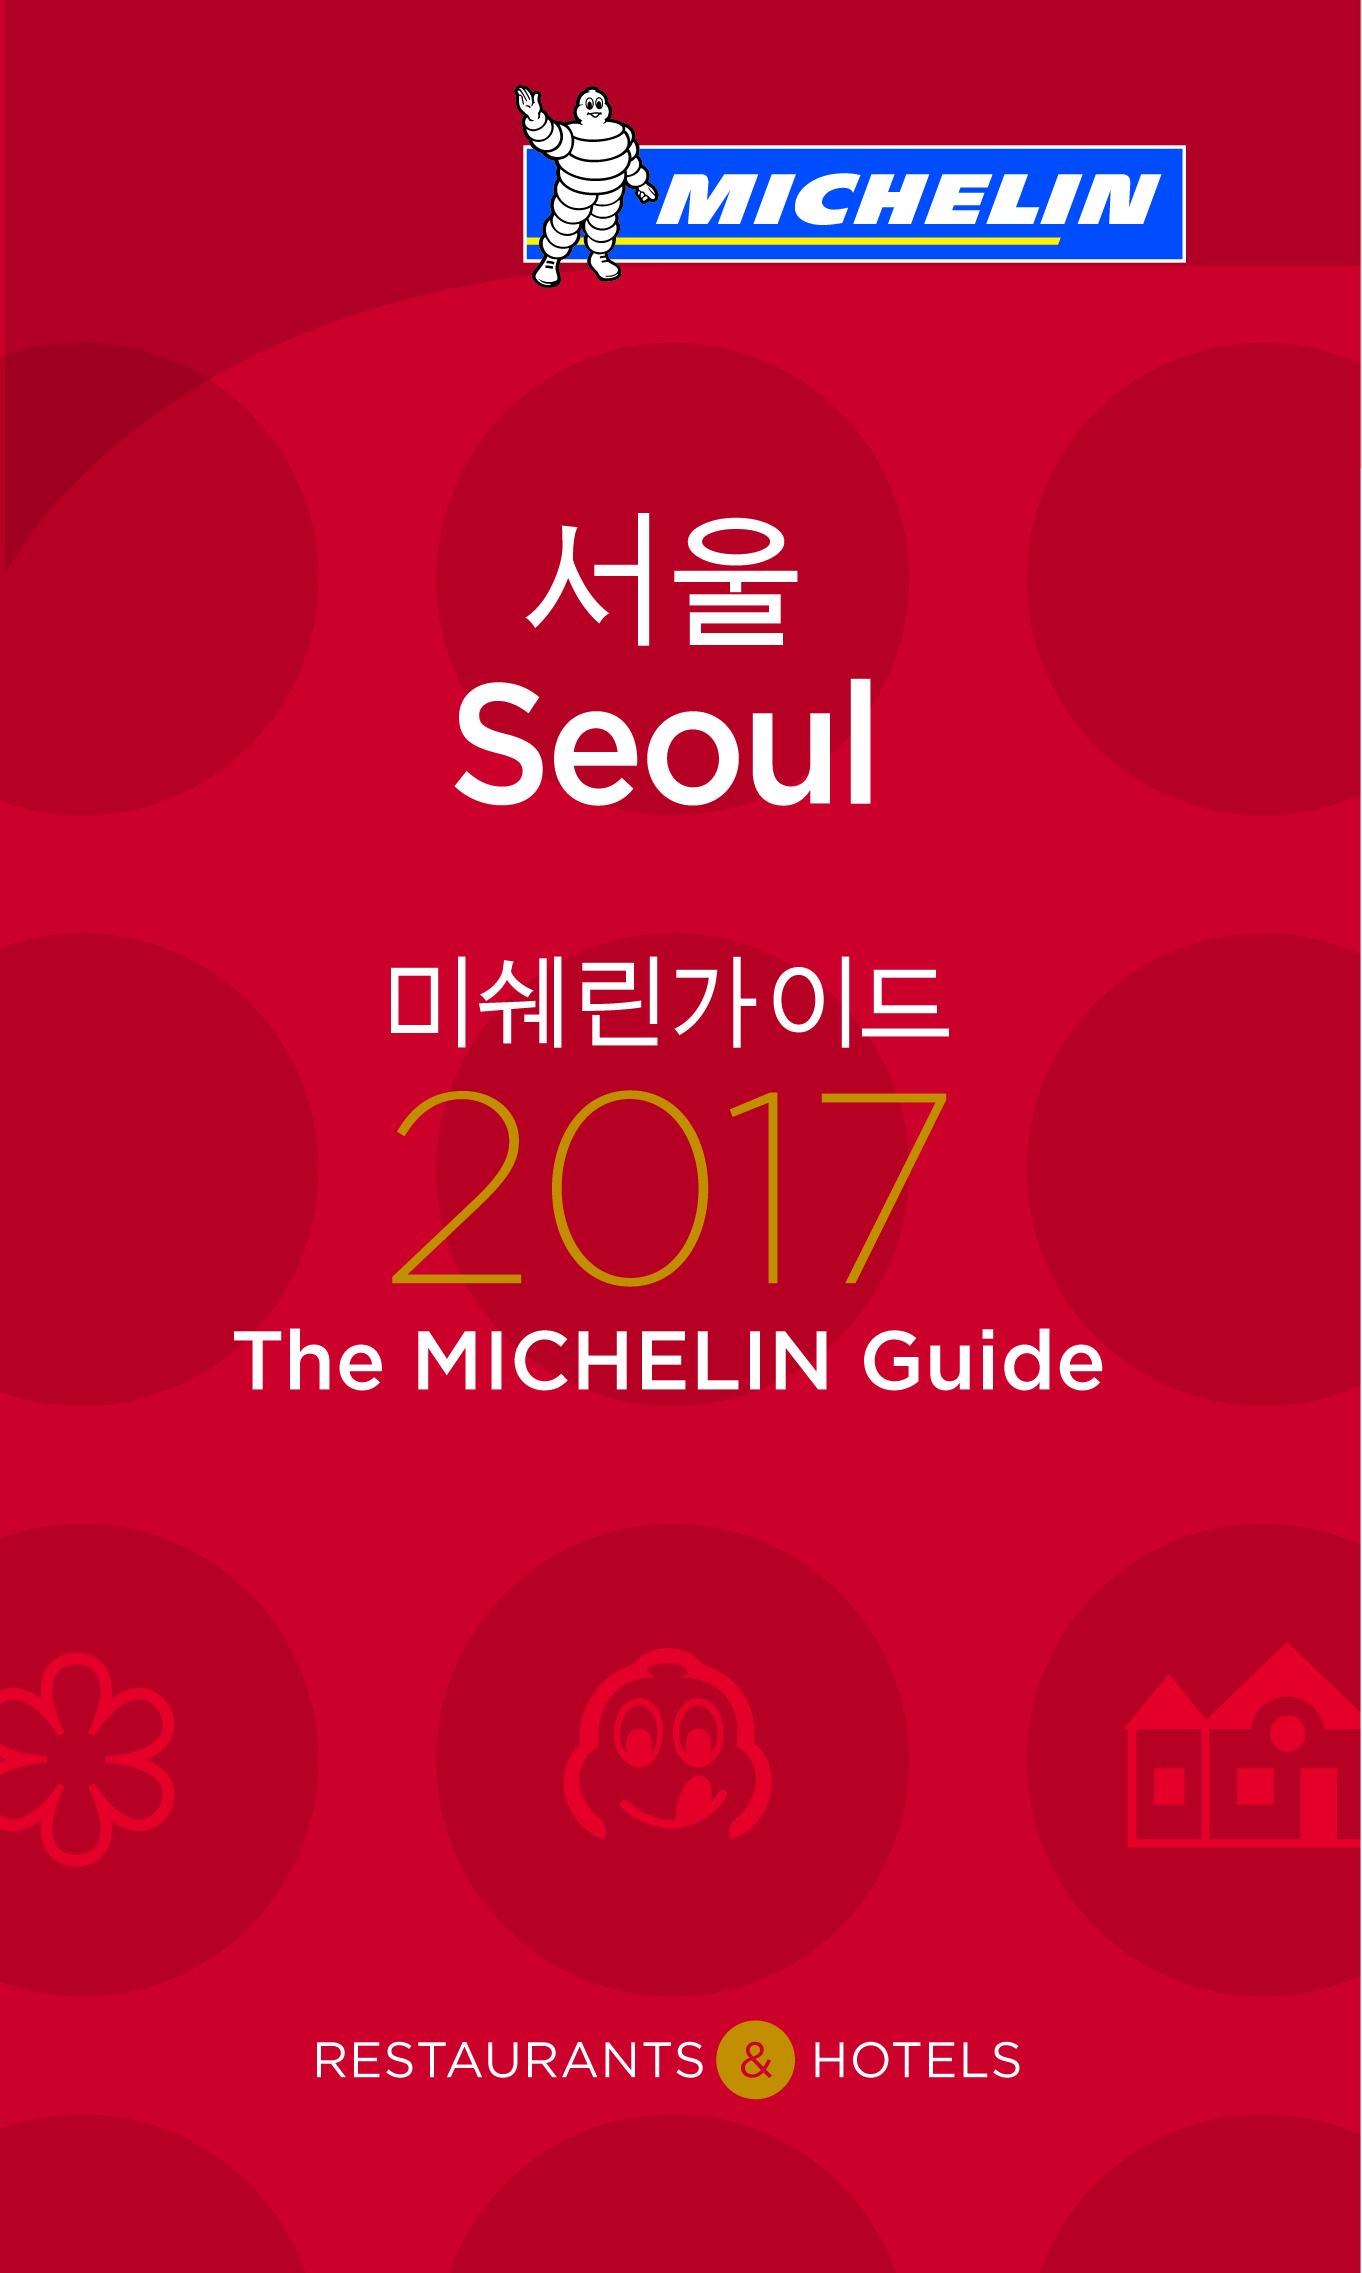 Michelin-starred restaurants - the Michelin Guide ...